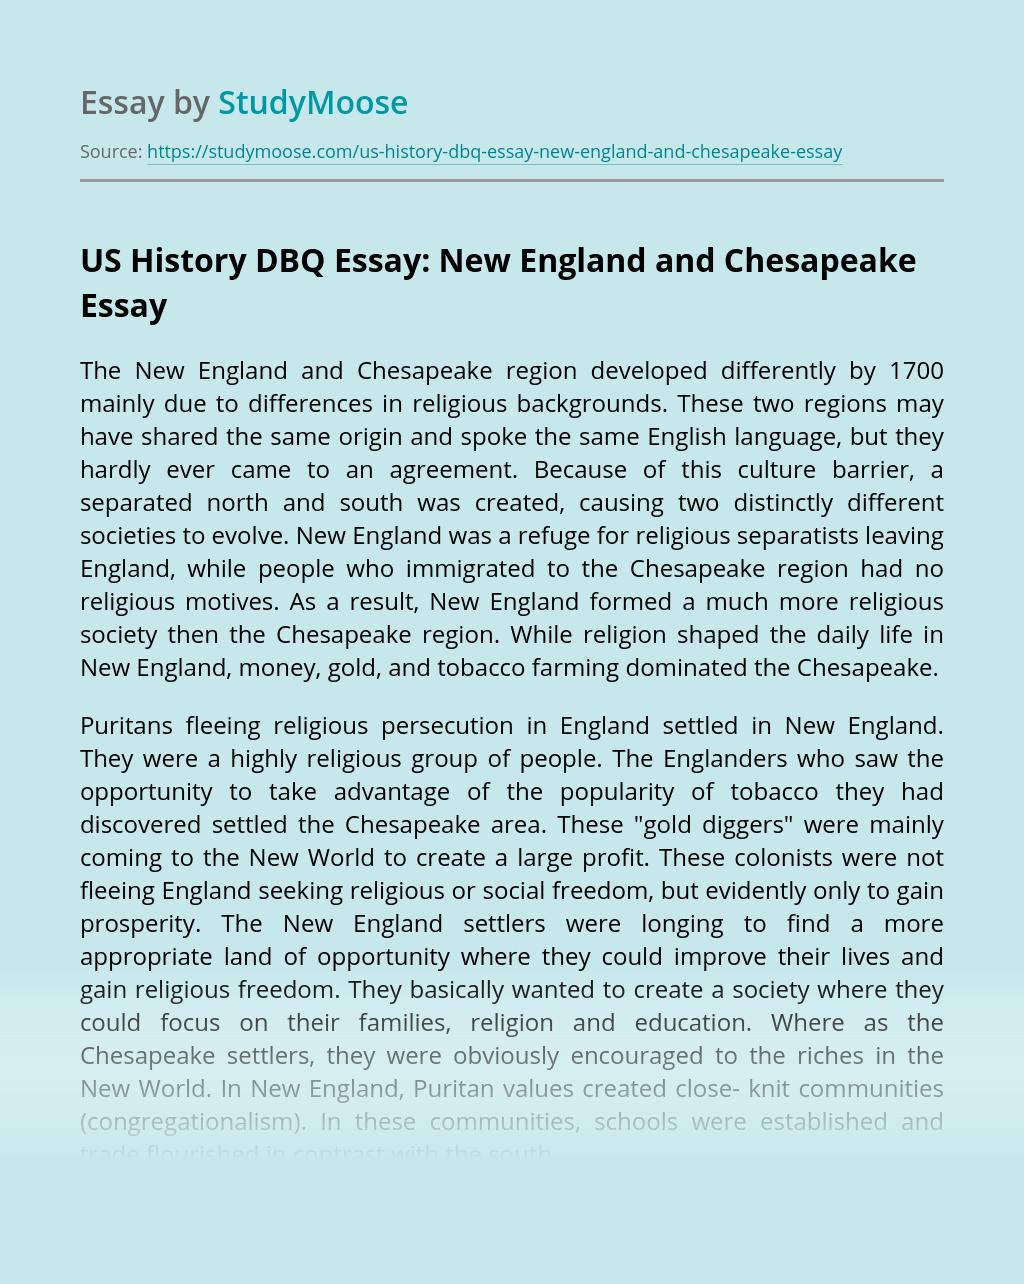 US History DBQ Essay: New England and Chesapeake